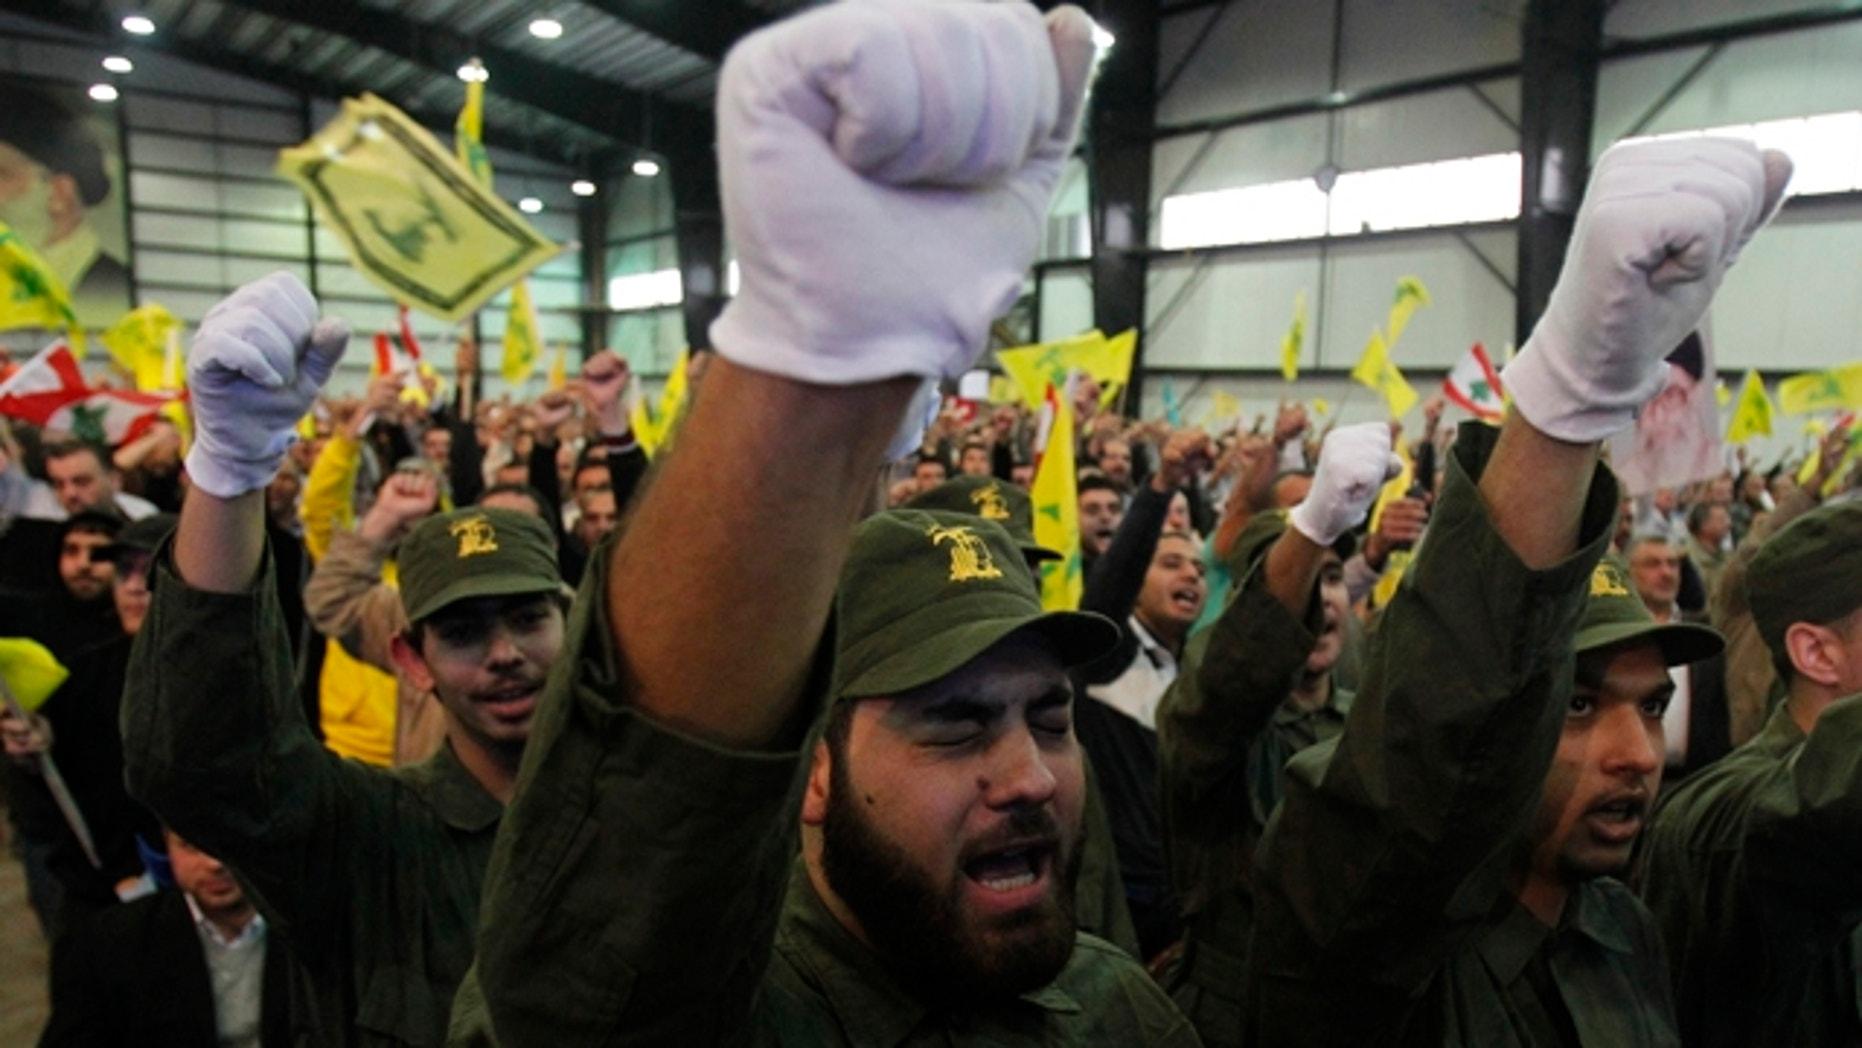 November 11, 2011: Lebanon's Hezbollah militants chant slogans as their leader Sayyed Hassan Nasrallah speaks during a rally marking Hezbollah's Martyr's Day in Beirut's suburbs